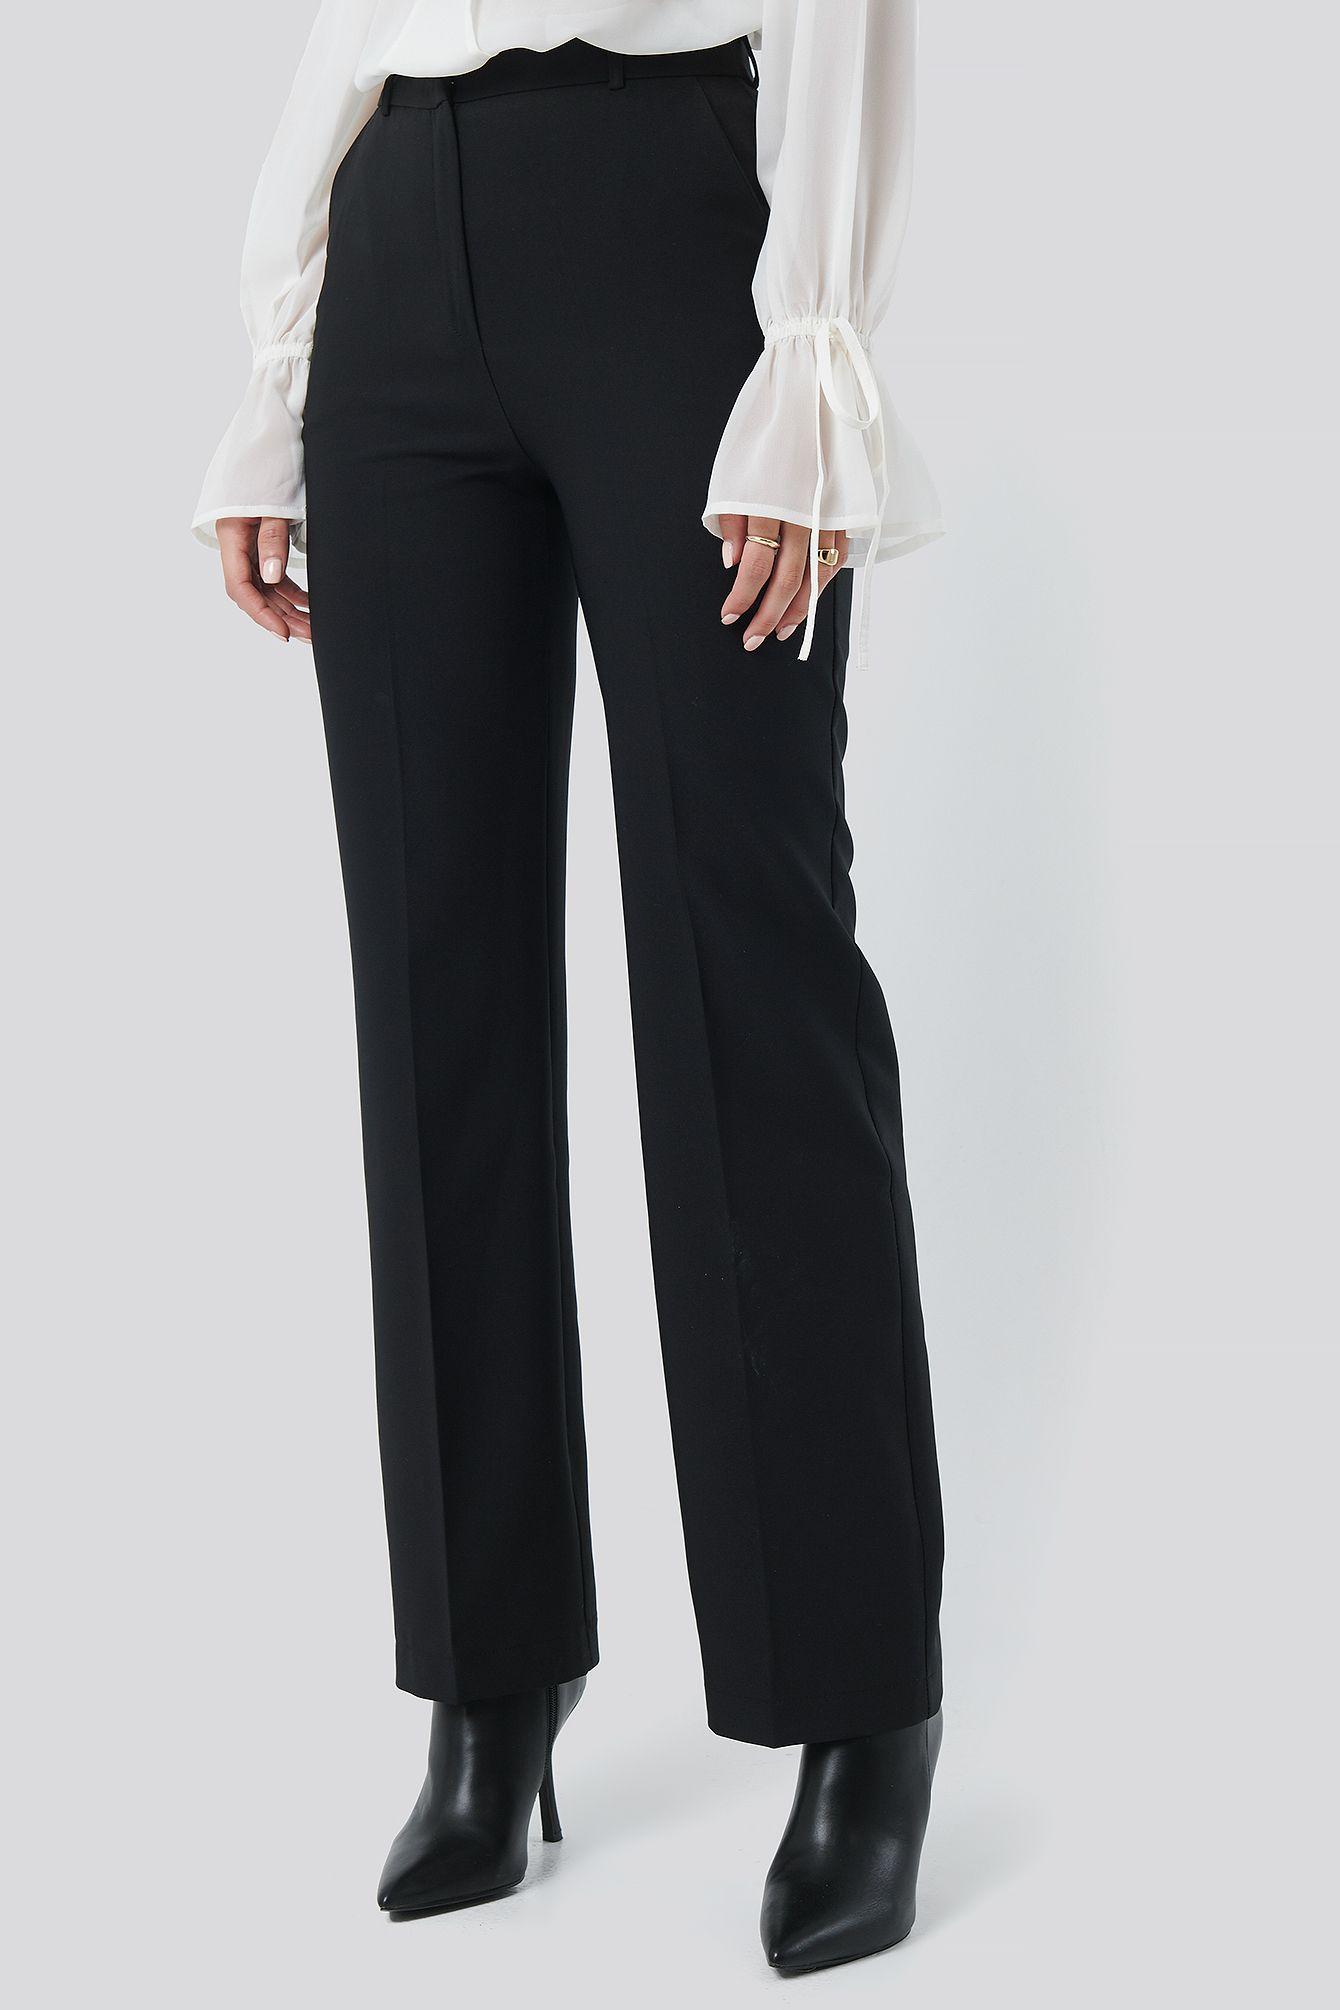 Photo of Seamline Suit Pant